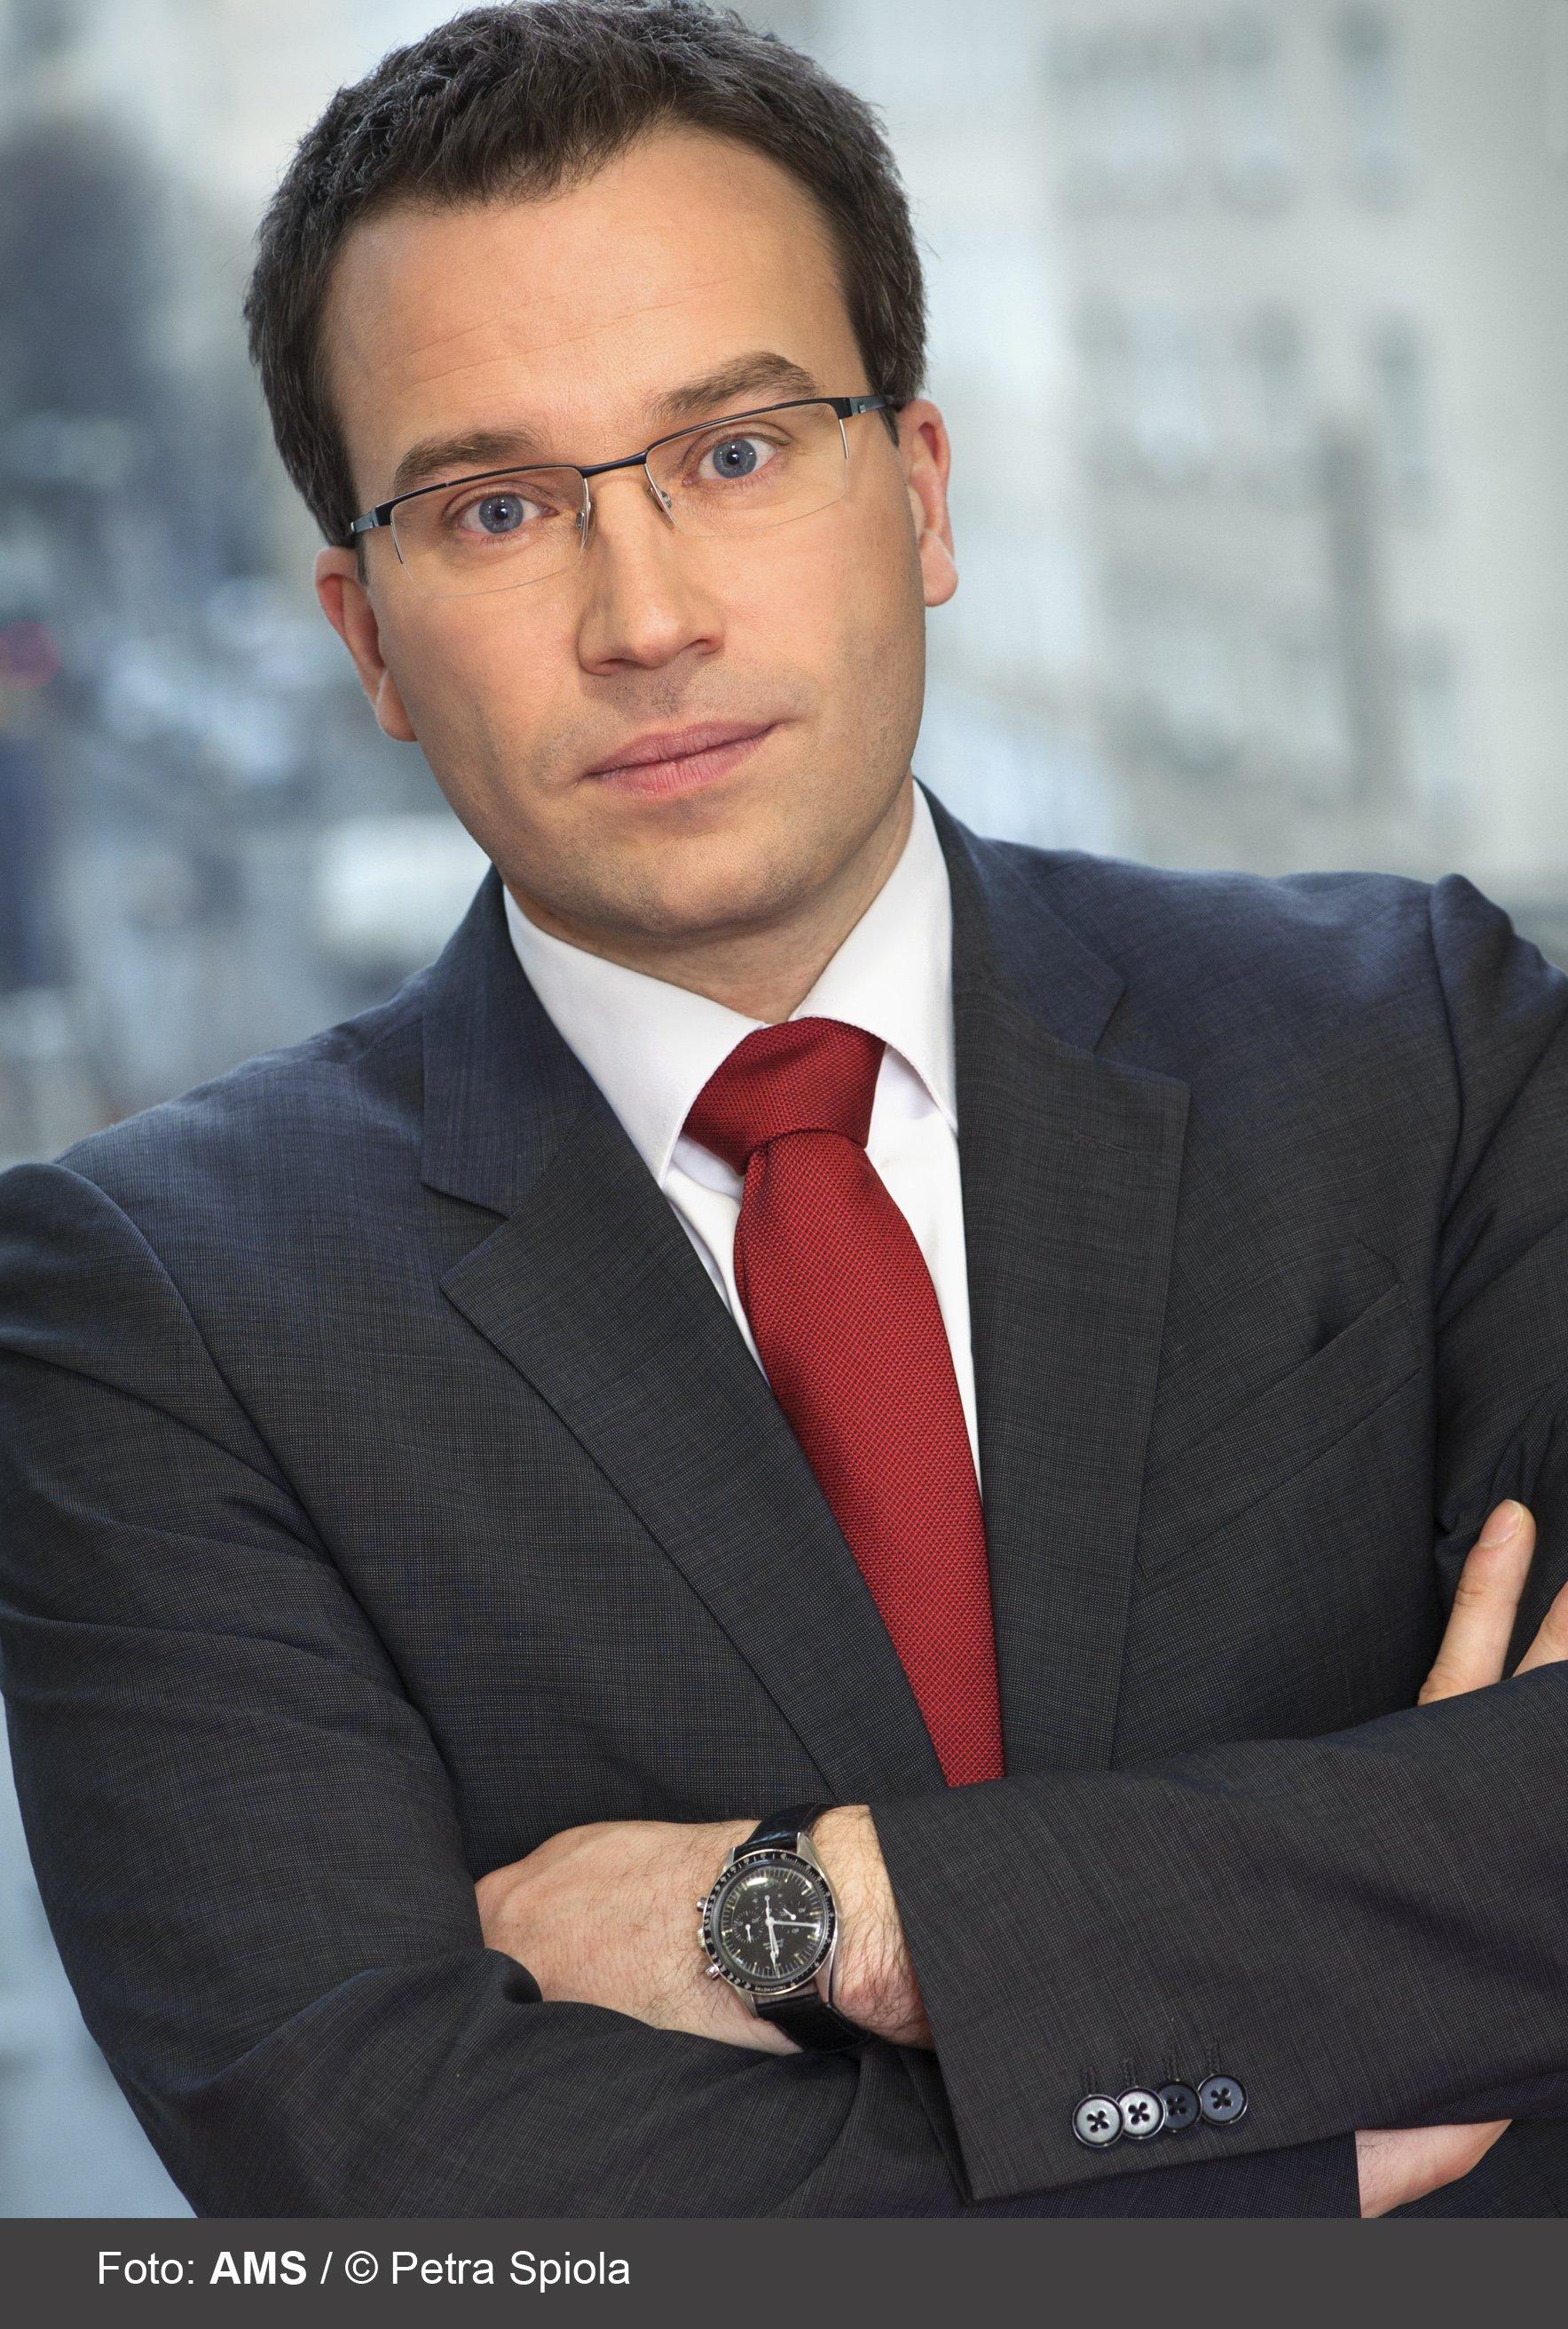 Austria – Dr. Johannes Kopf